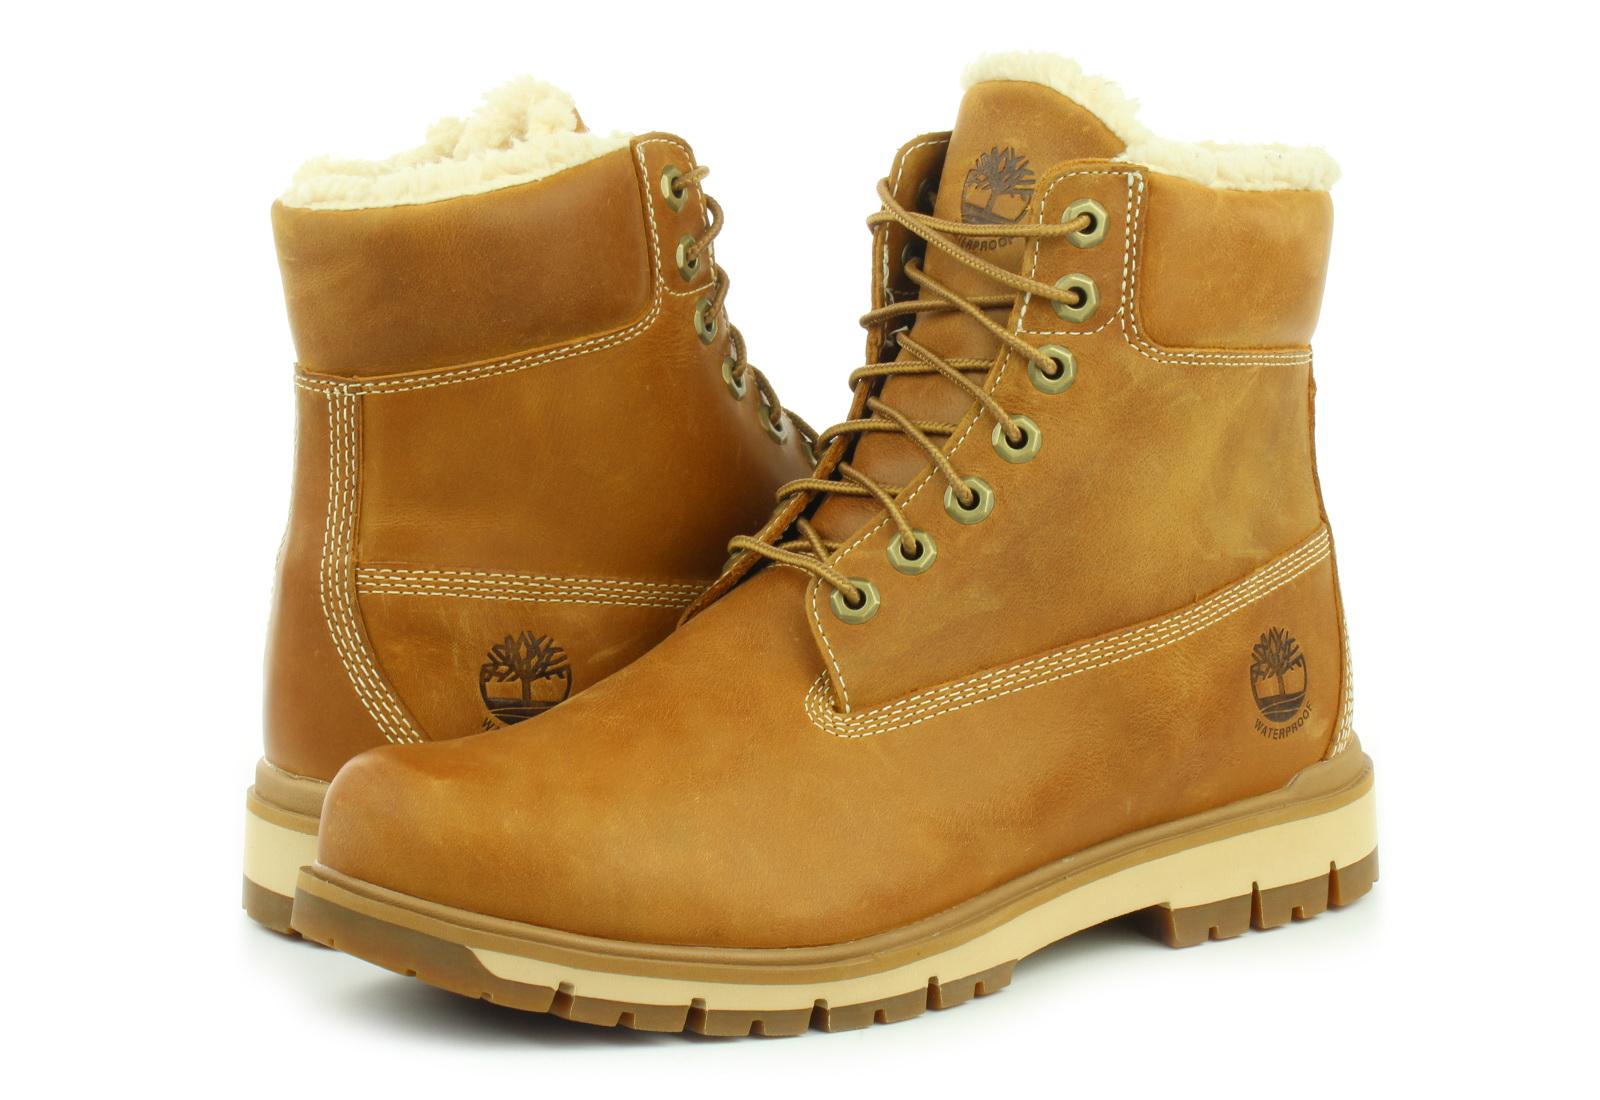 Timberland Boty Radford Warm Lined Boot Wp